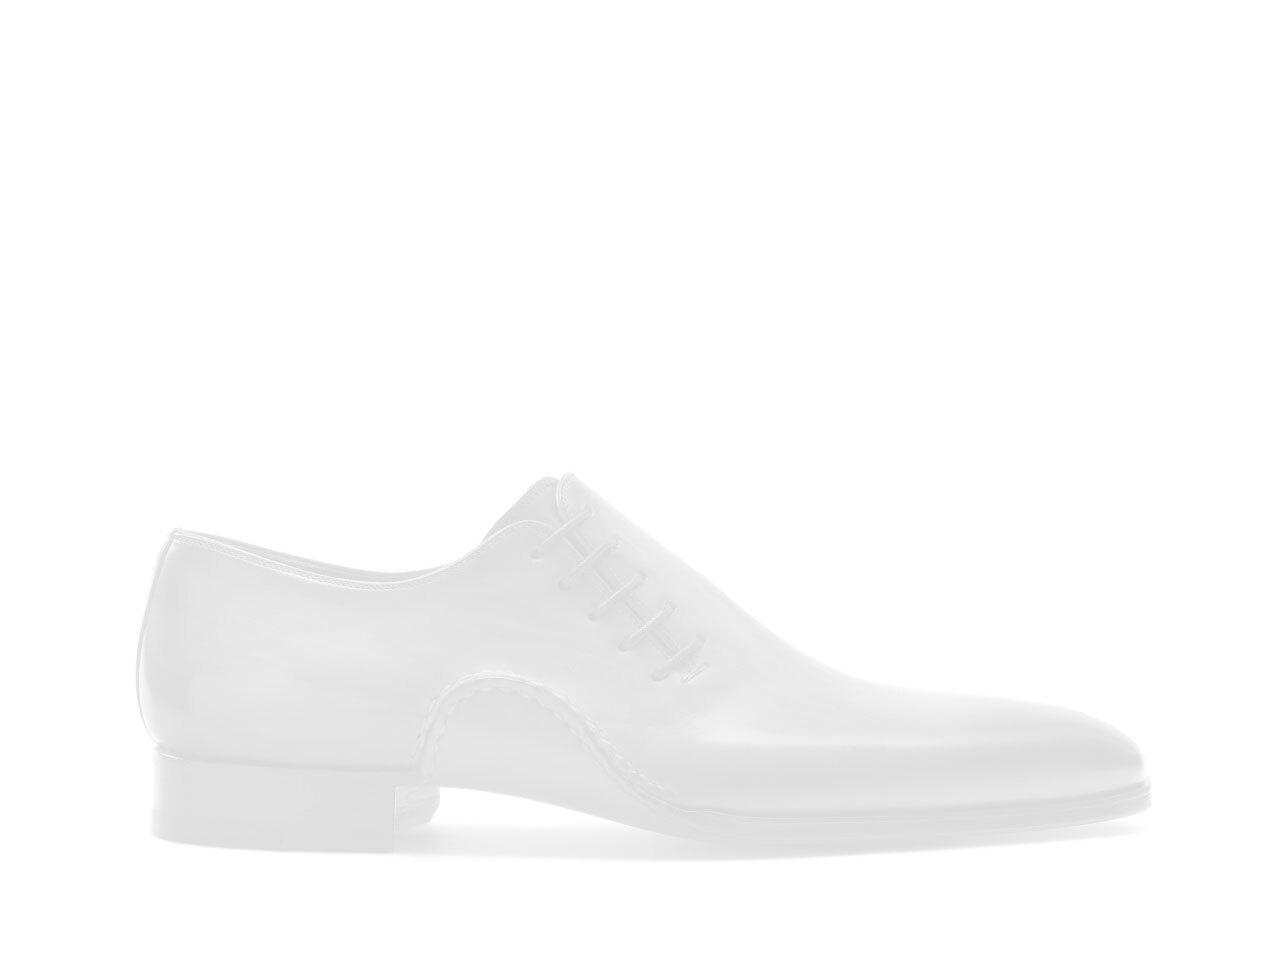 Pair of the Magnanni Cesar Black Patent Men's Oxford Shoes